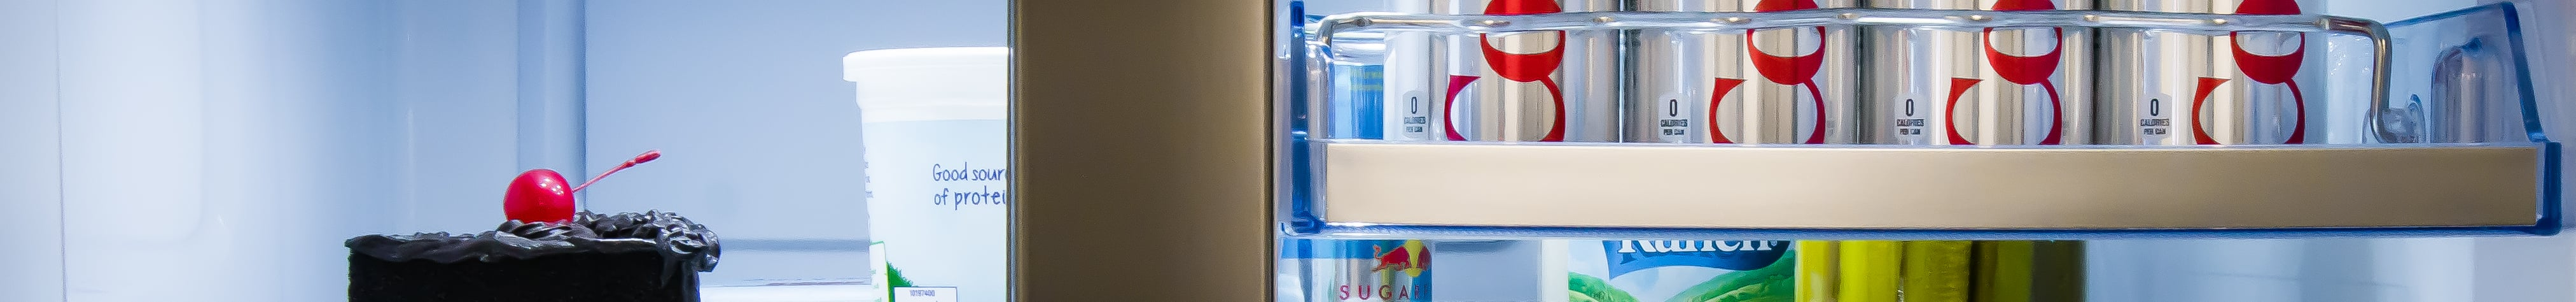 Samsung Rf28hdedbsr Refrigerator Review Reviewed Com